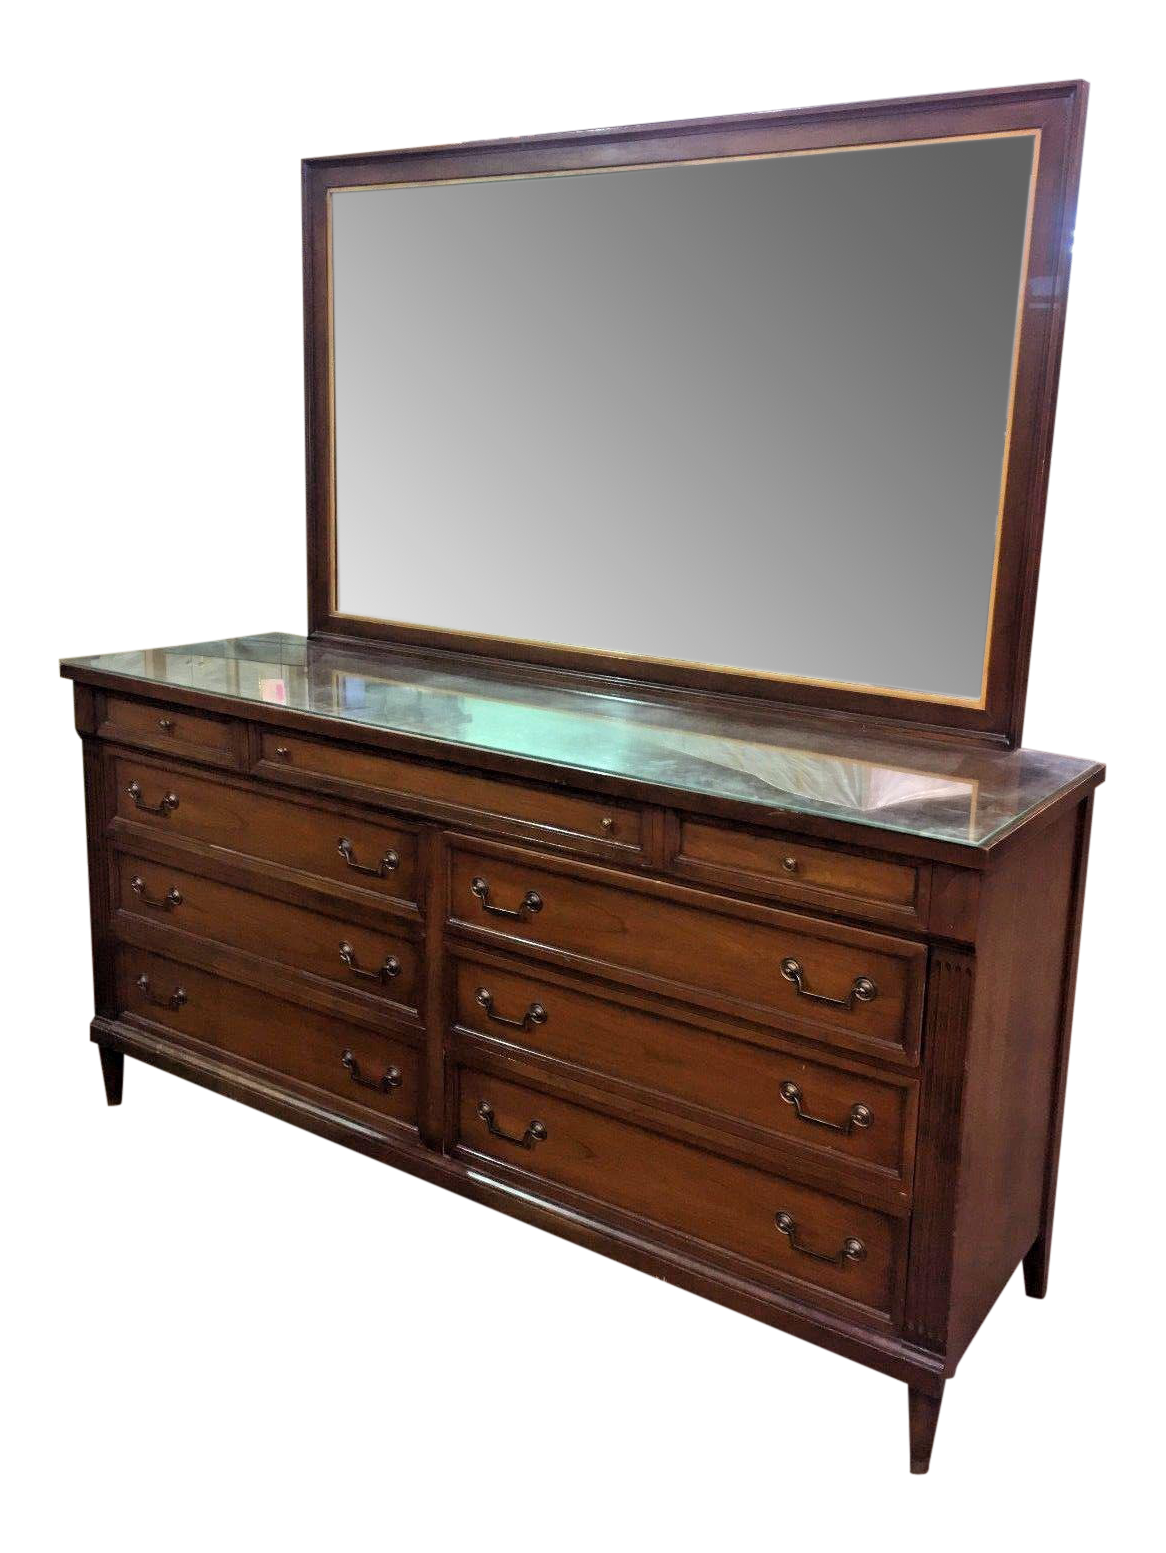 phenix furniture co mid century modern dresser with mirror chairish. Black Bedroom Furniture Sets. Home Design Ideas